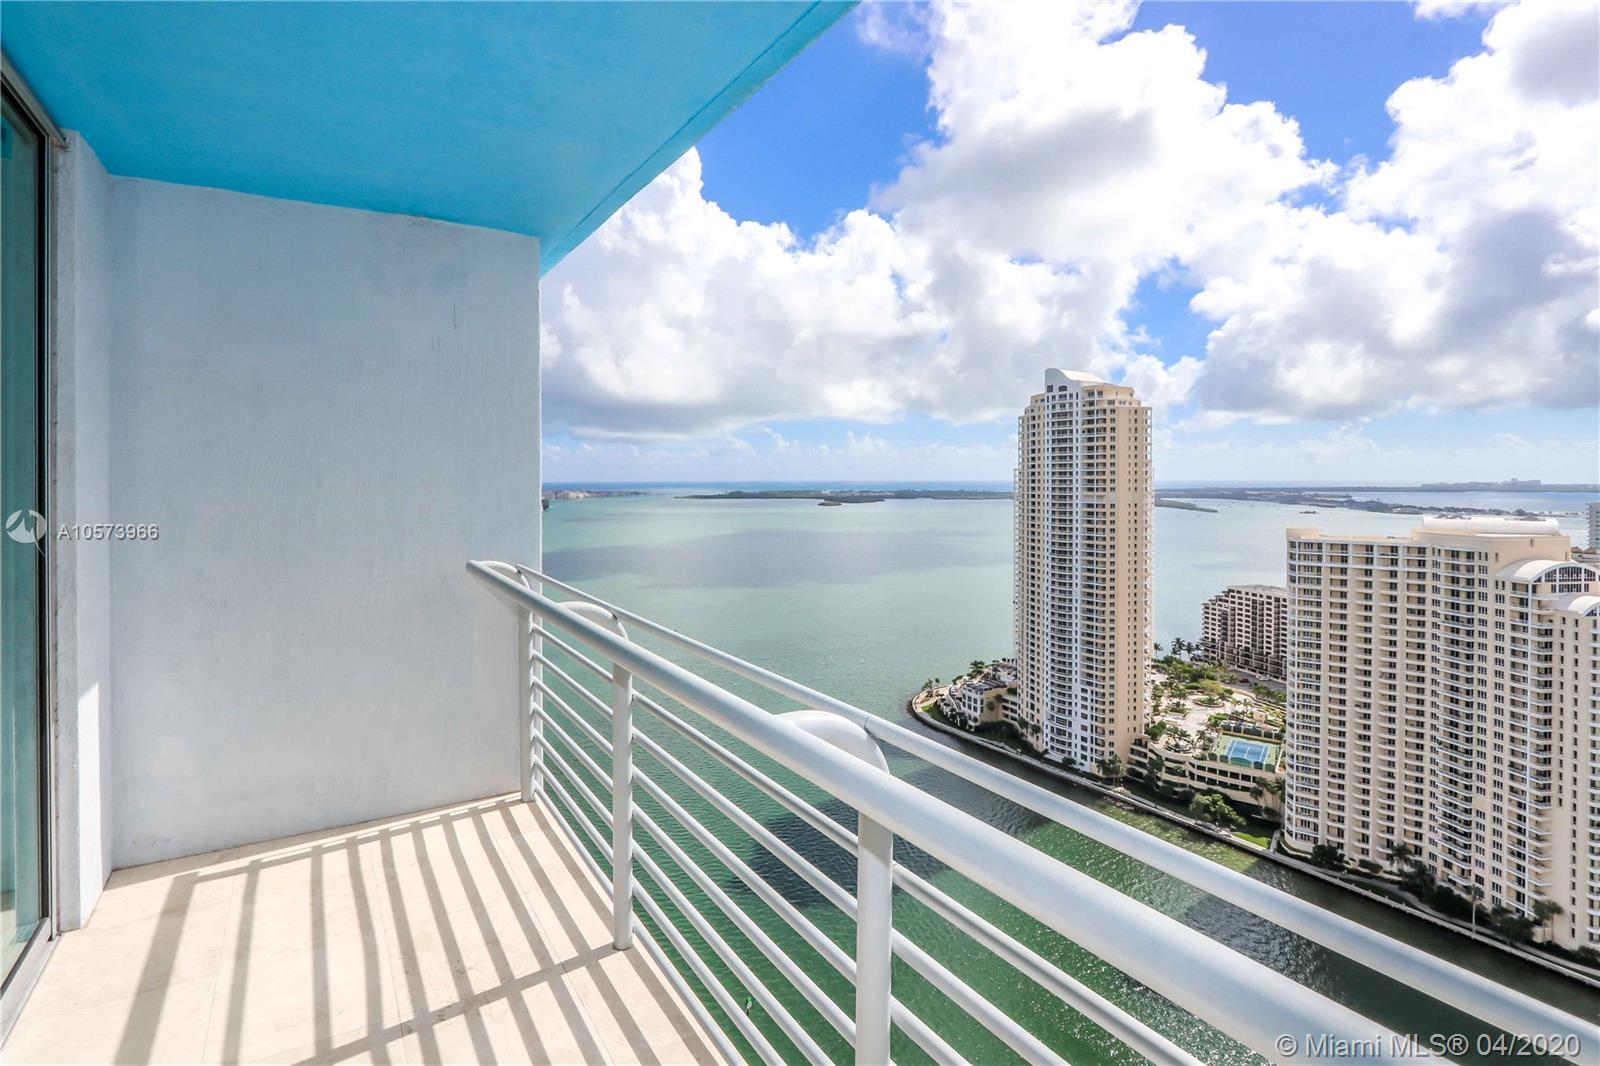 335 S Biscayne Blvd #3801, Miami FL 33131